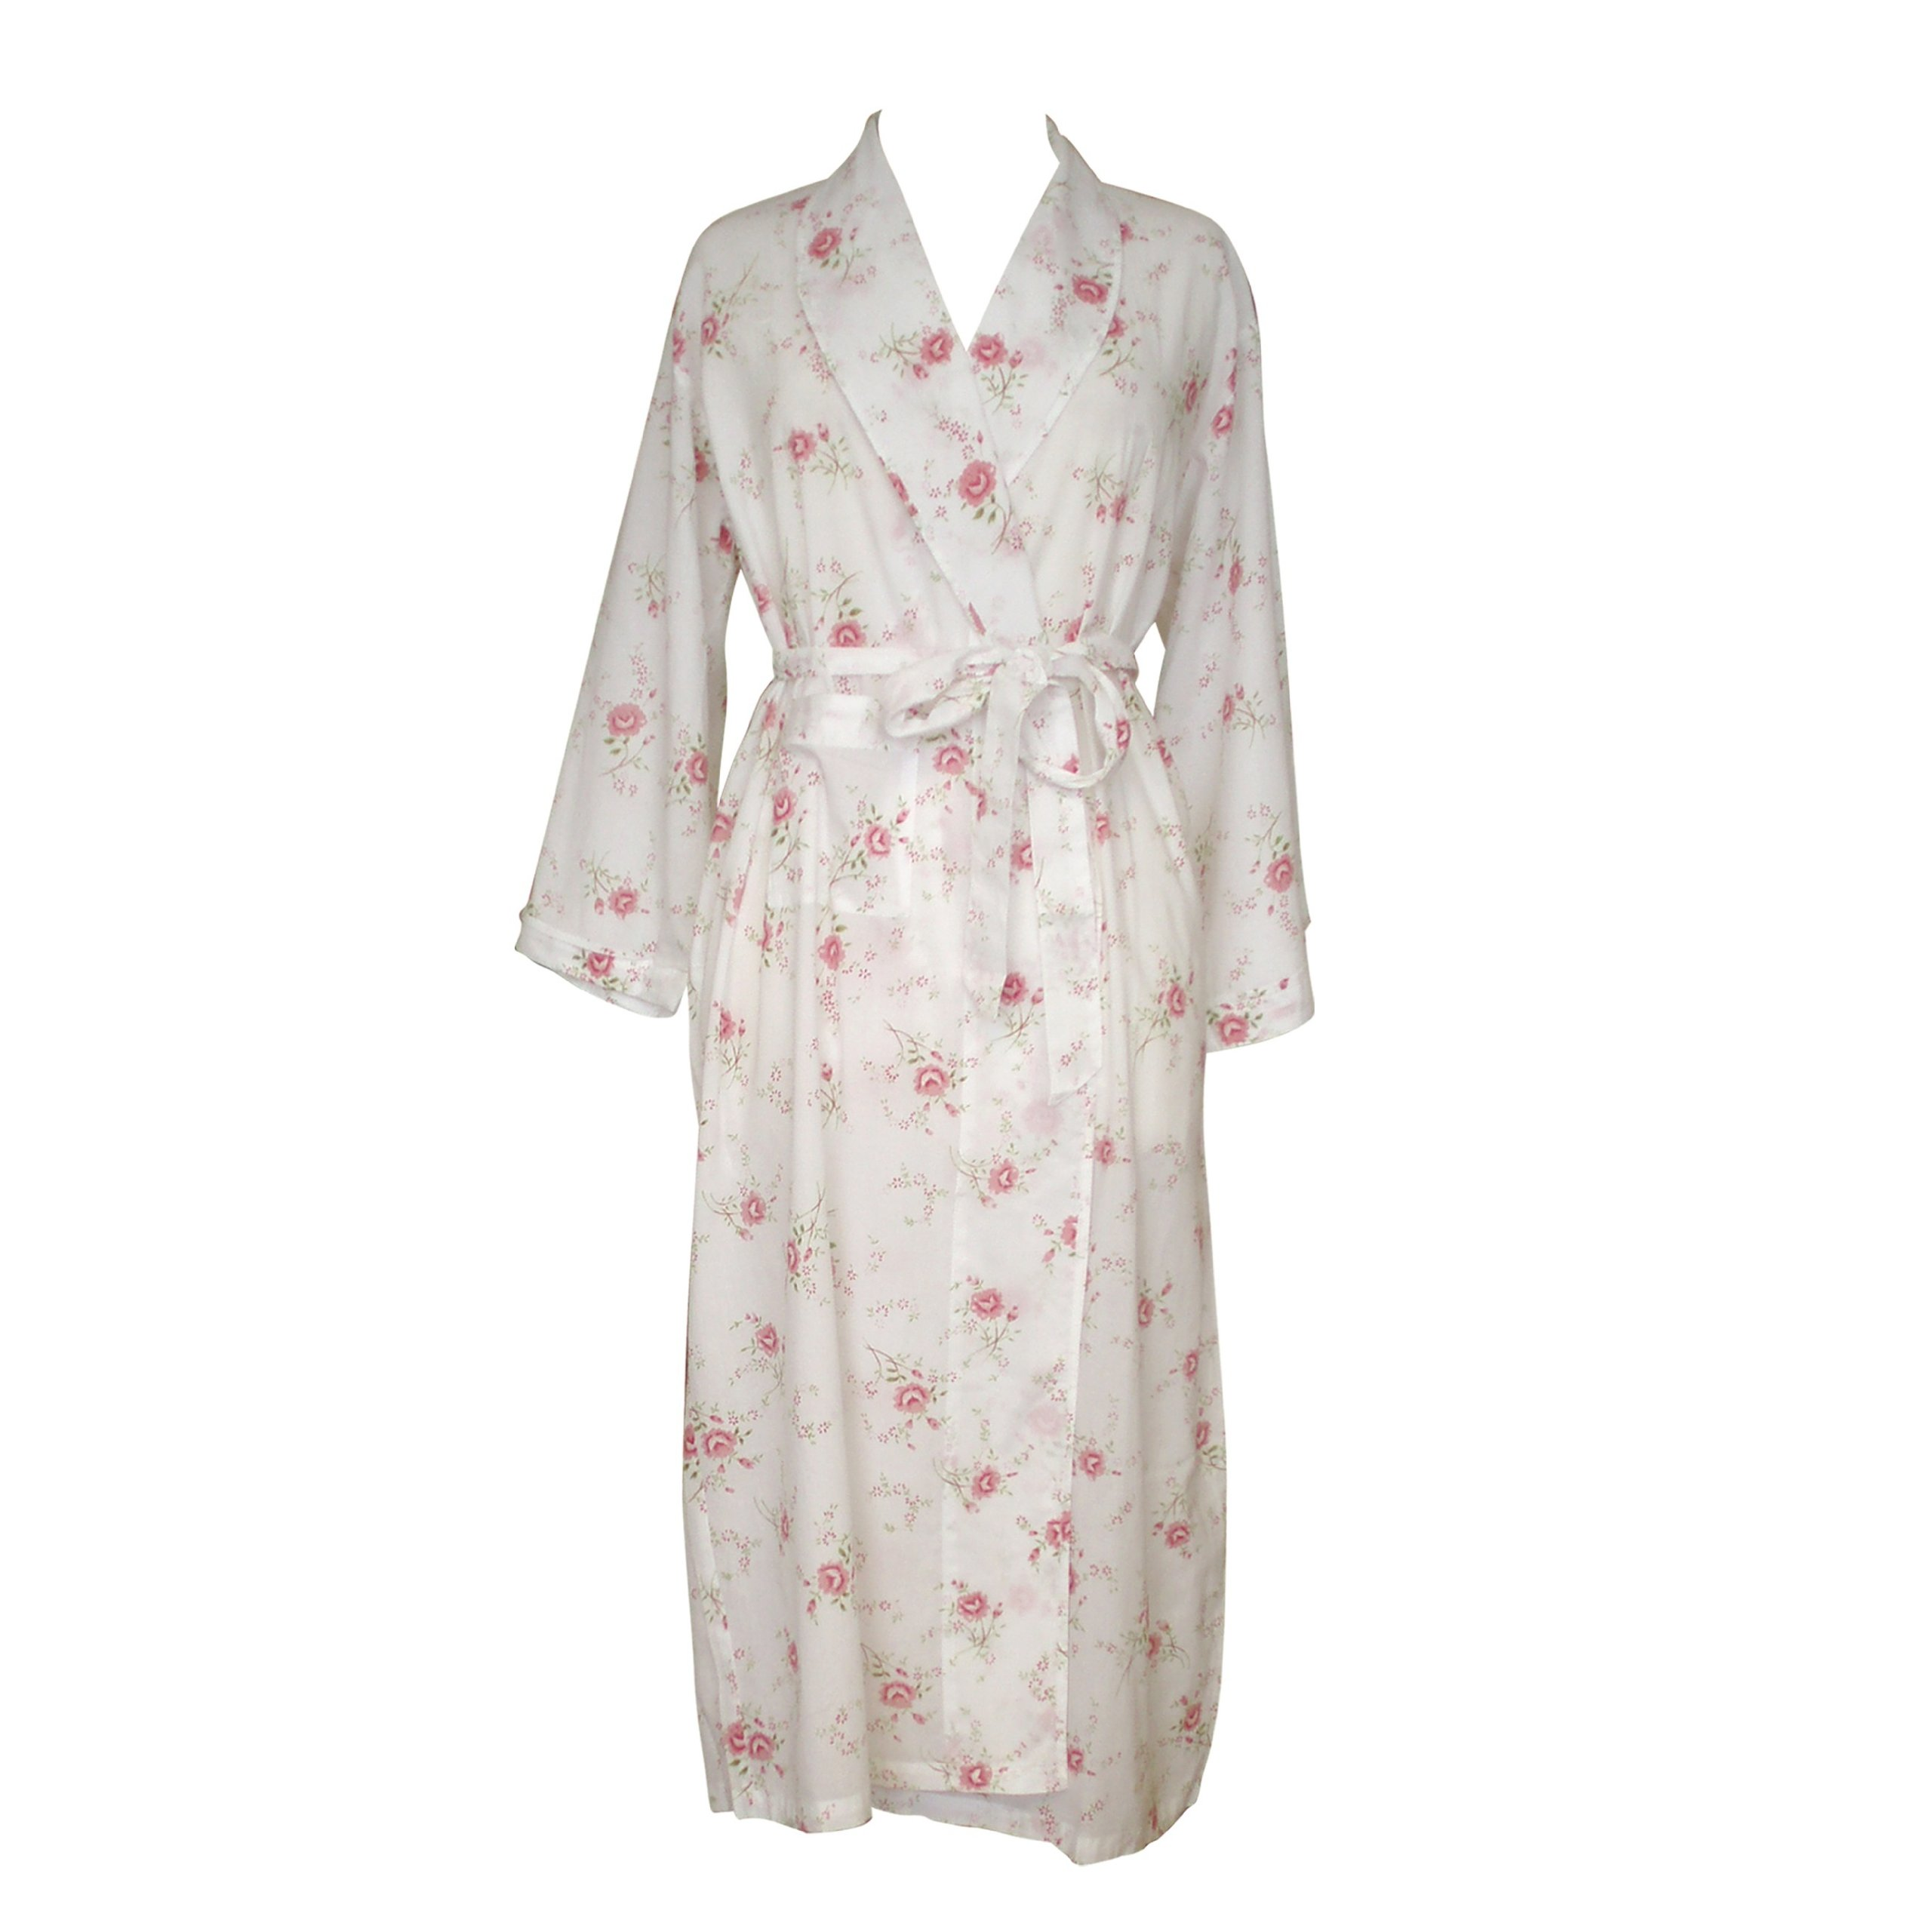 The Irish Linen Store Womens Katie Cotton Rose Floral Robe Medium Floral